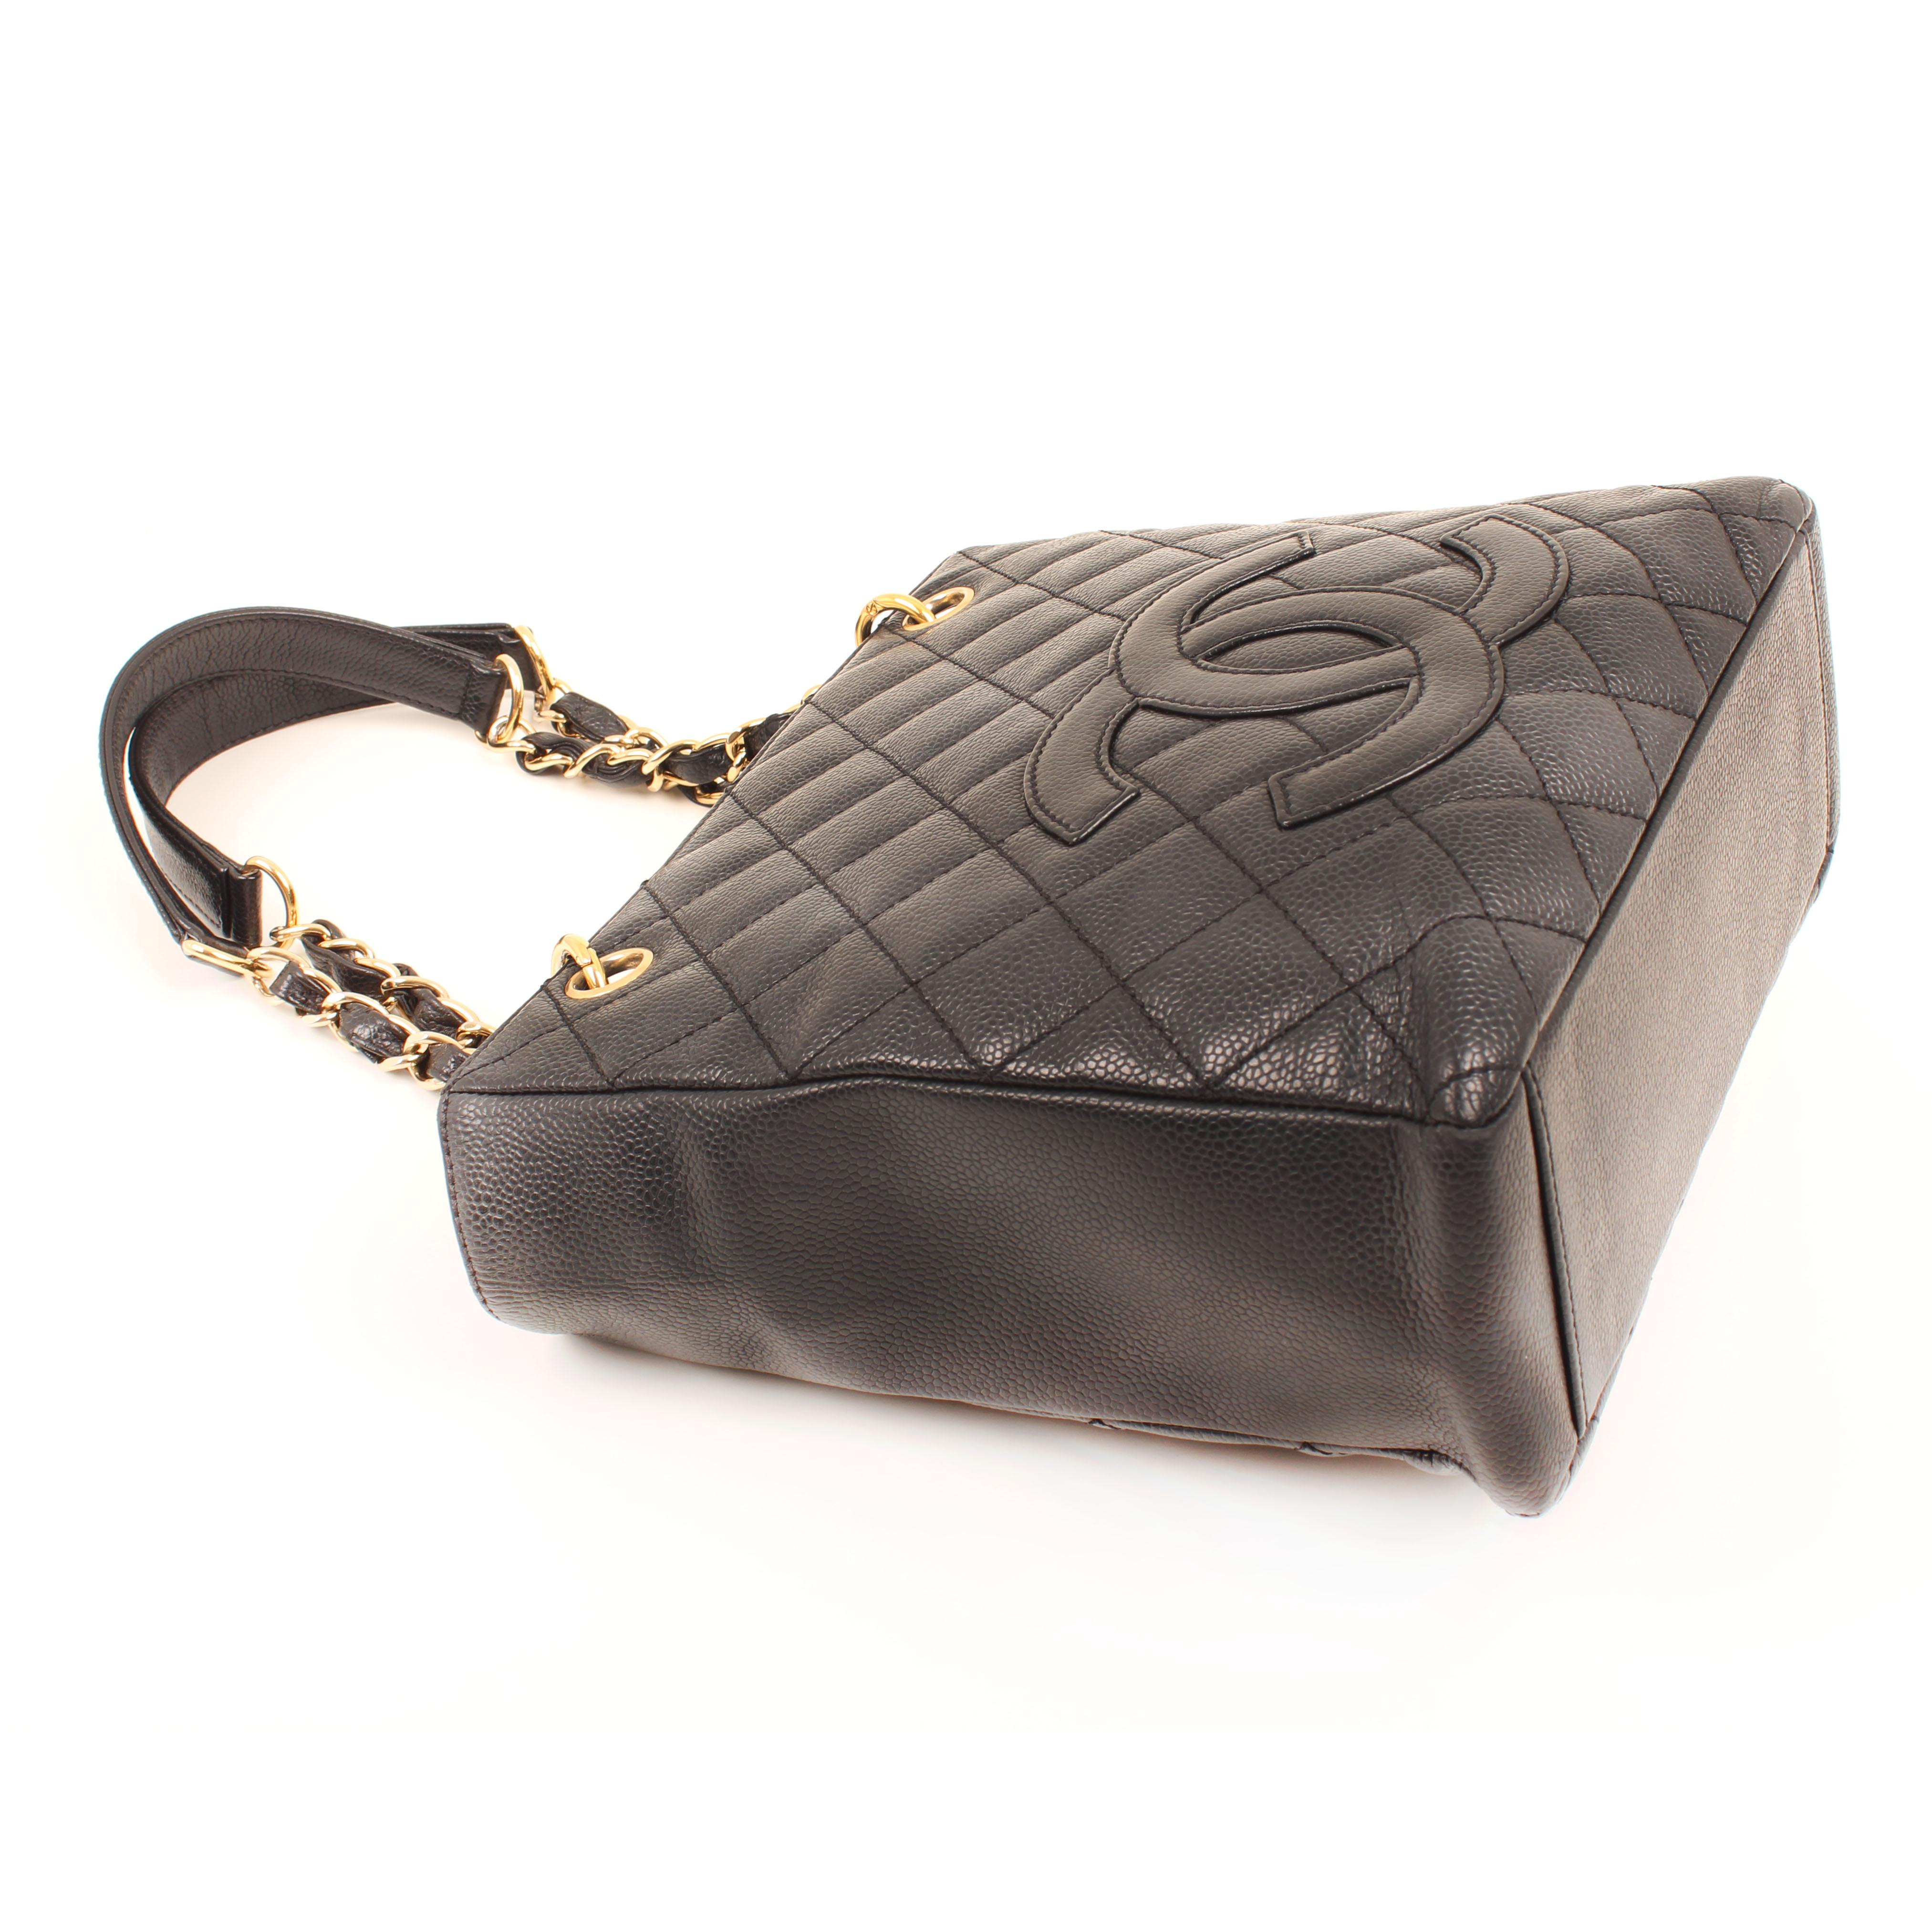 12e81d3dab3a Chanel Petite Shopping Tote Caviar Leather Black Shoulder Bag I CBL Bags